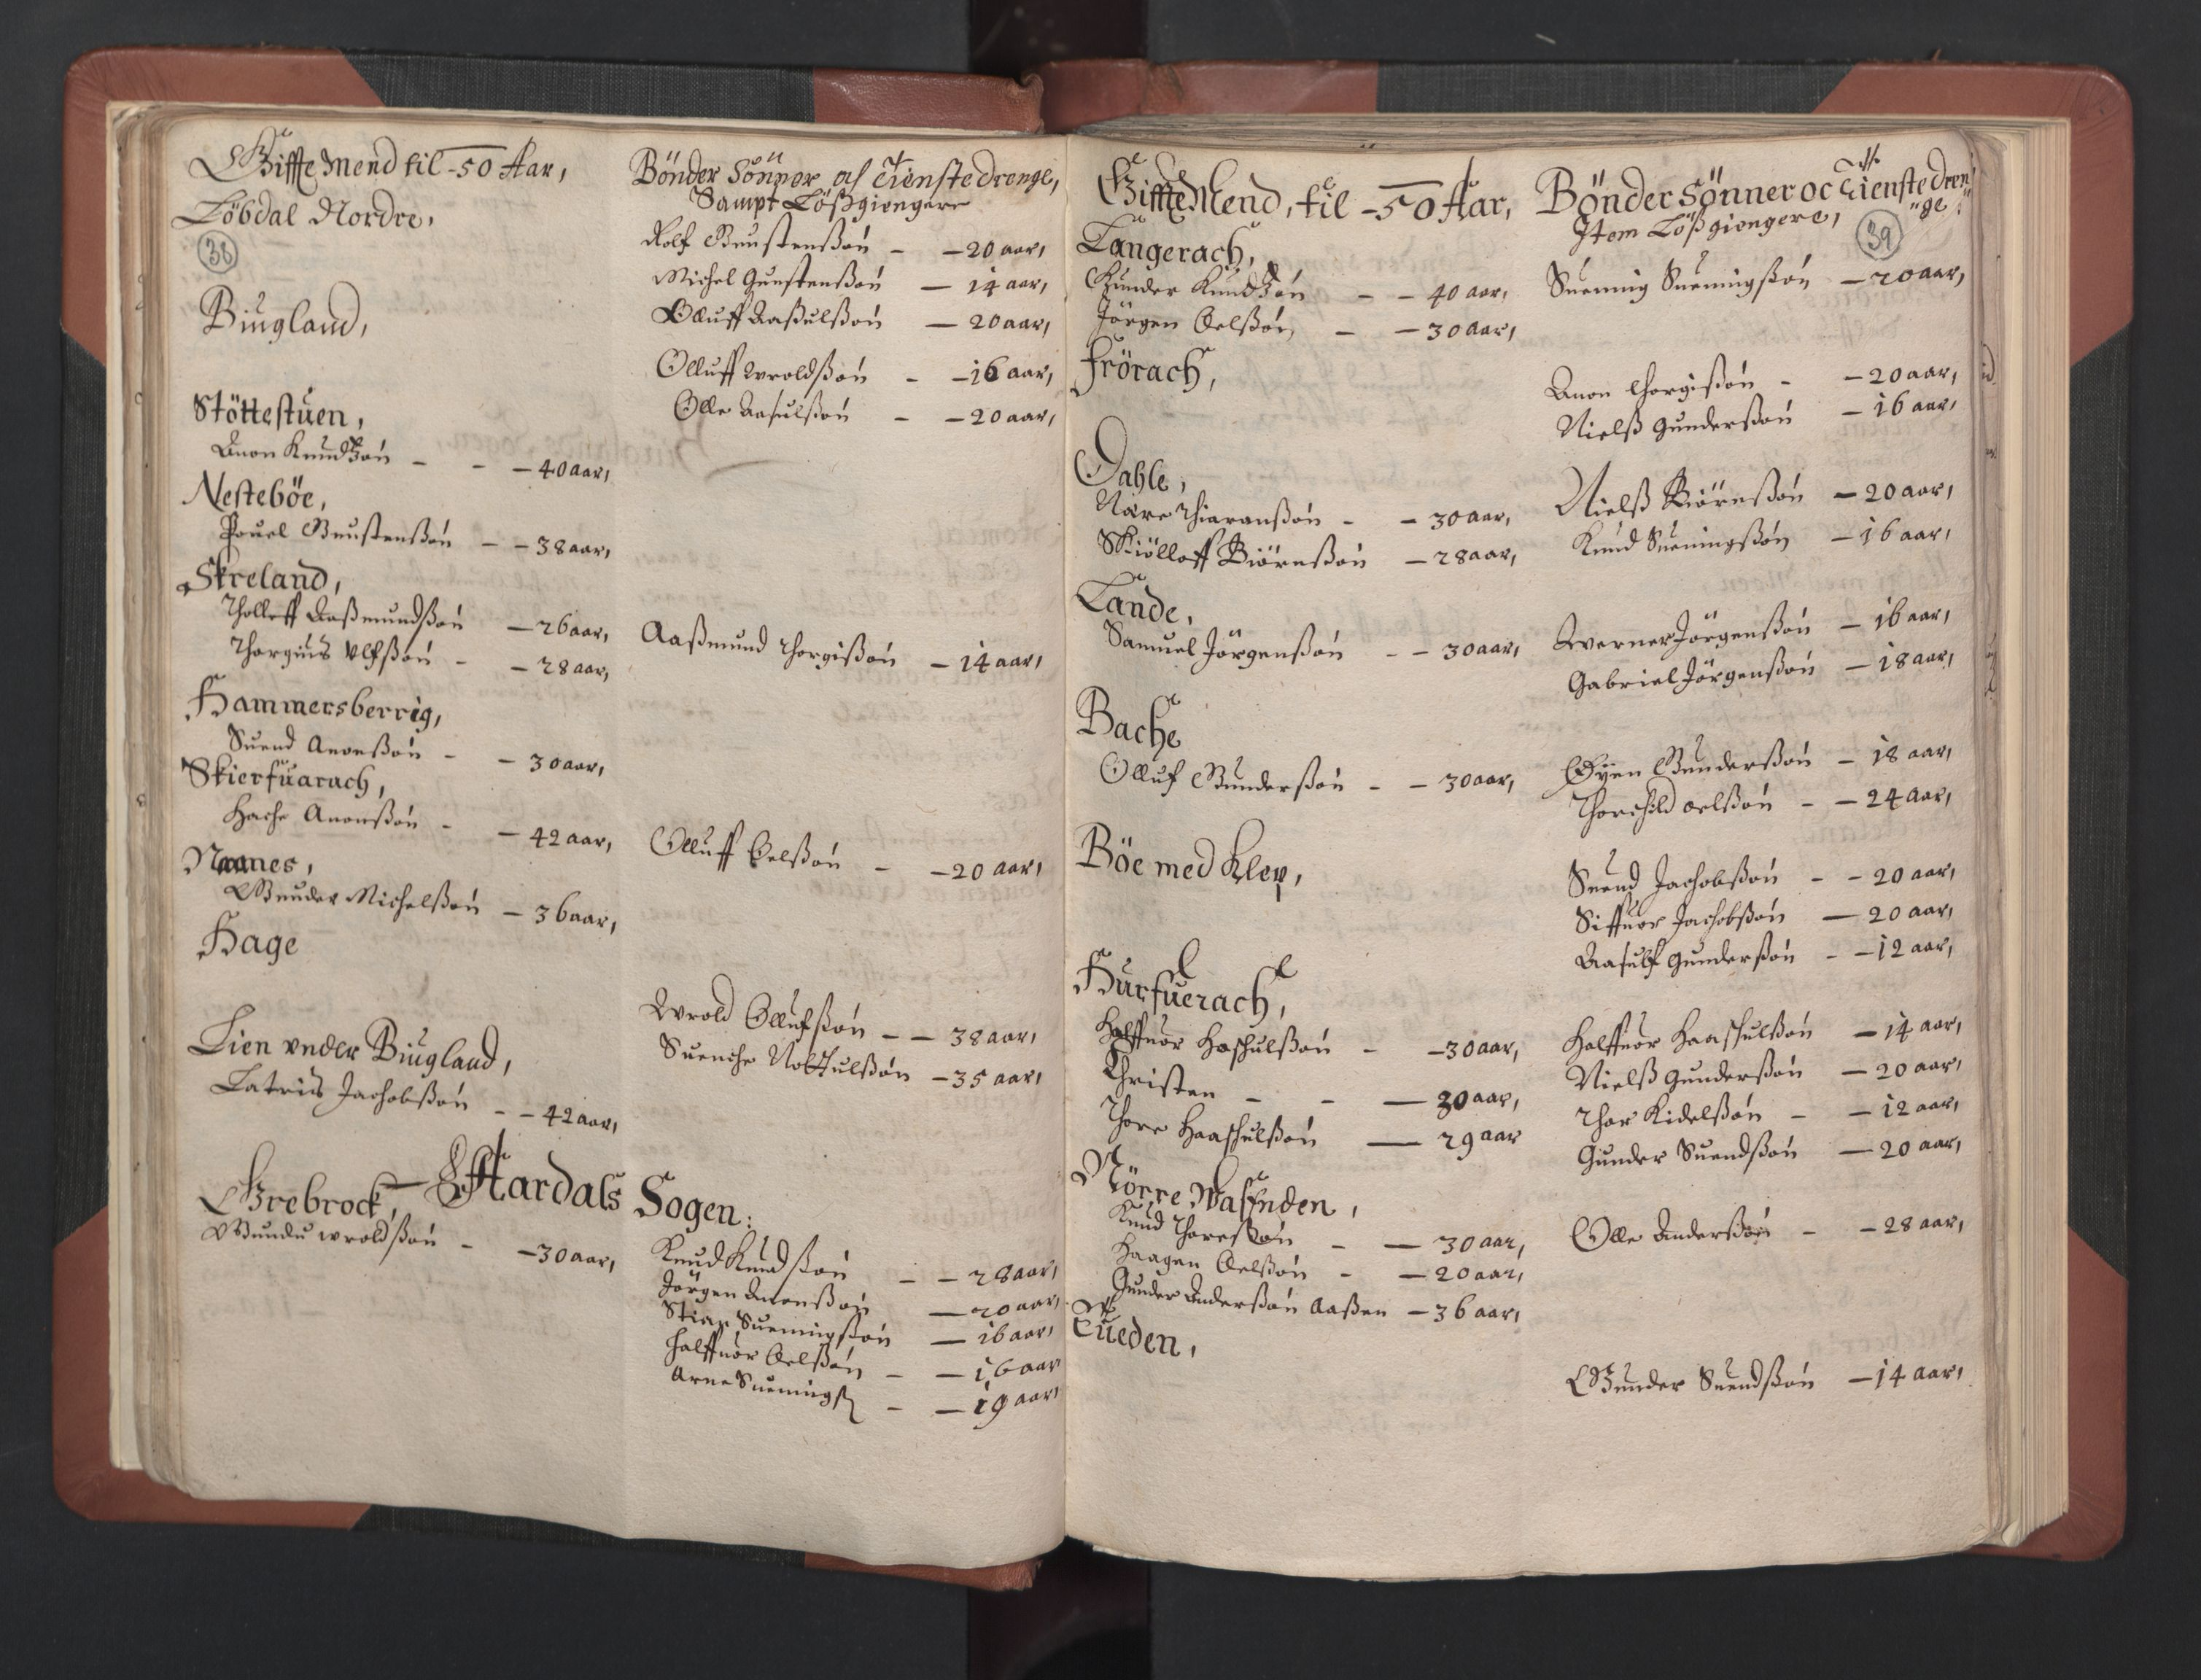 RA, Fogdenes og sorenskrivernes manntall 1664-1666, nr. 8: Råbyggelaget fogderi, 1664-1665, s. 38-39